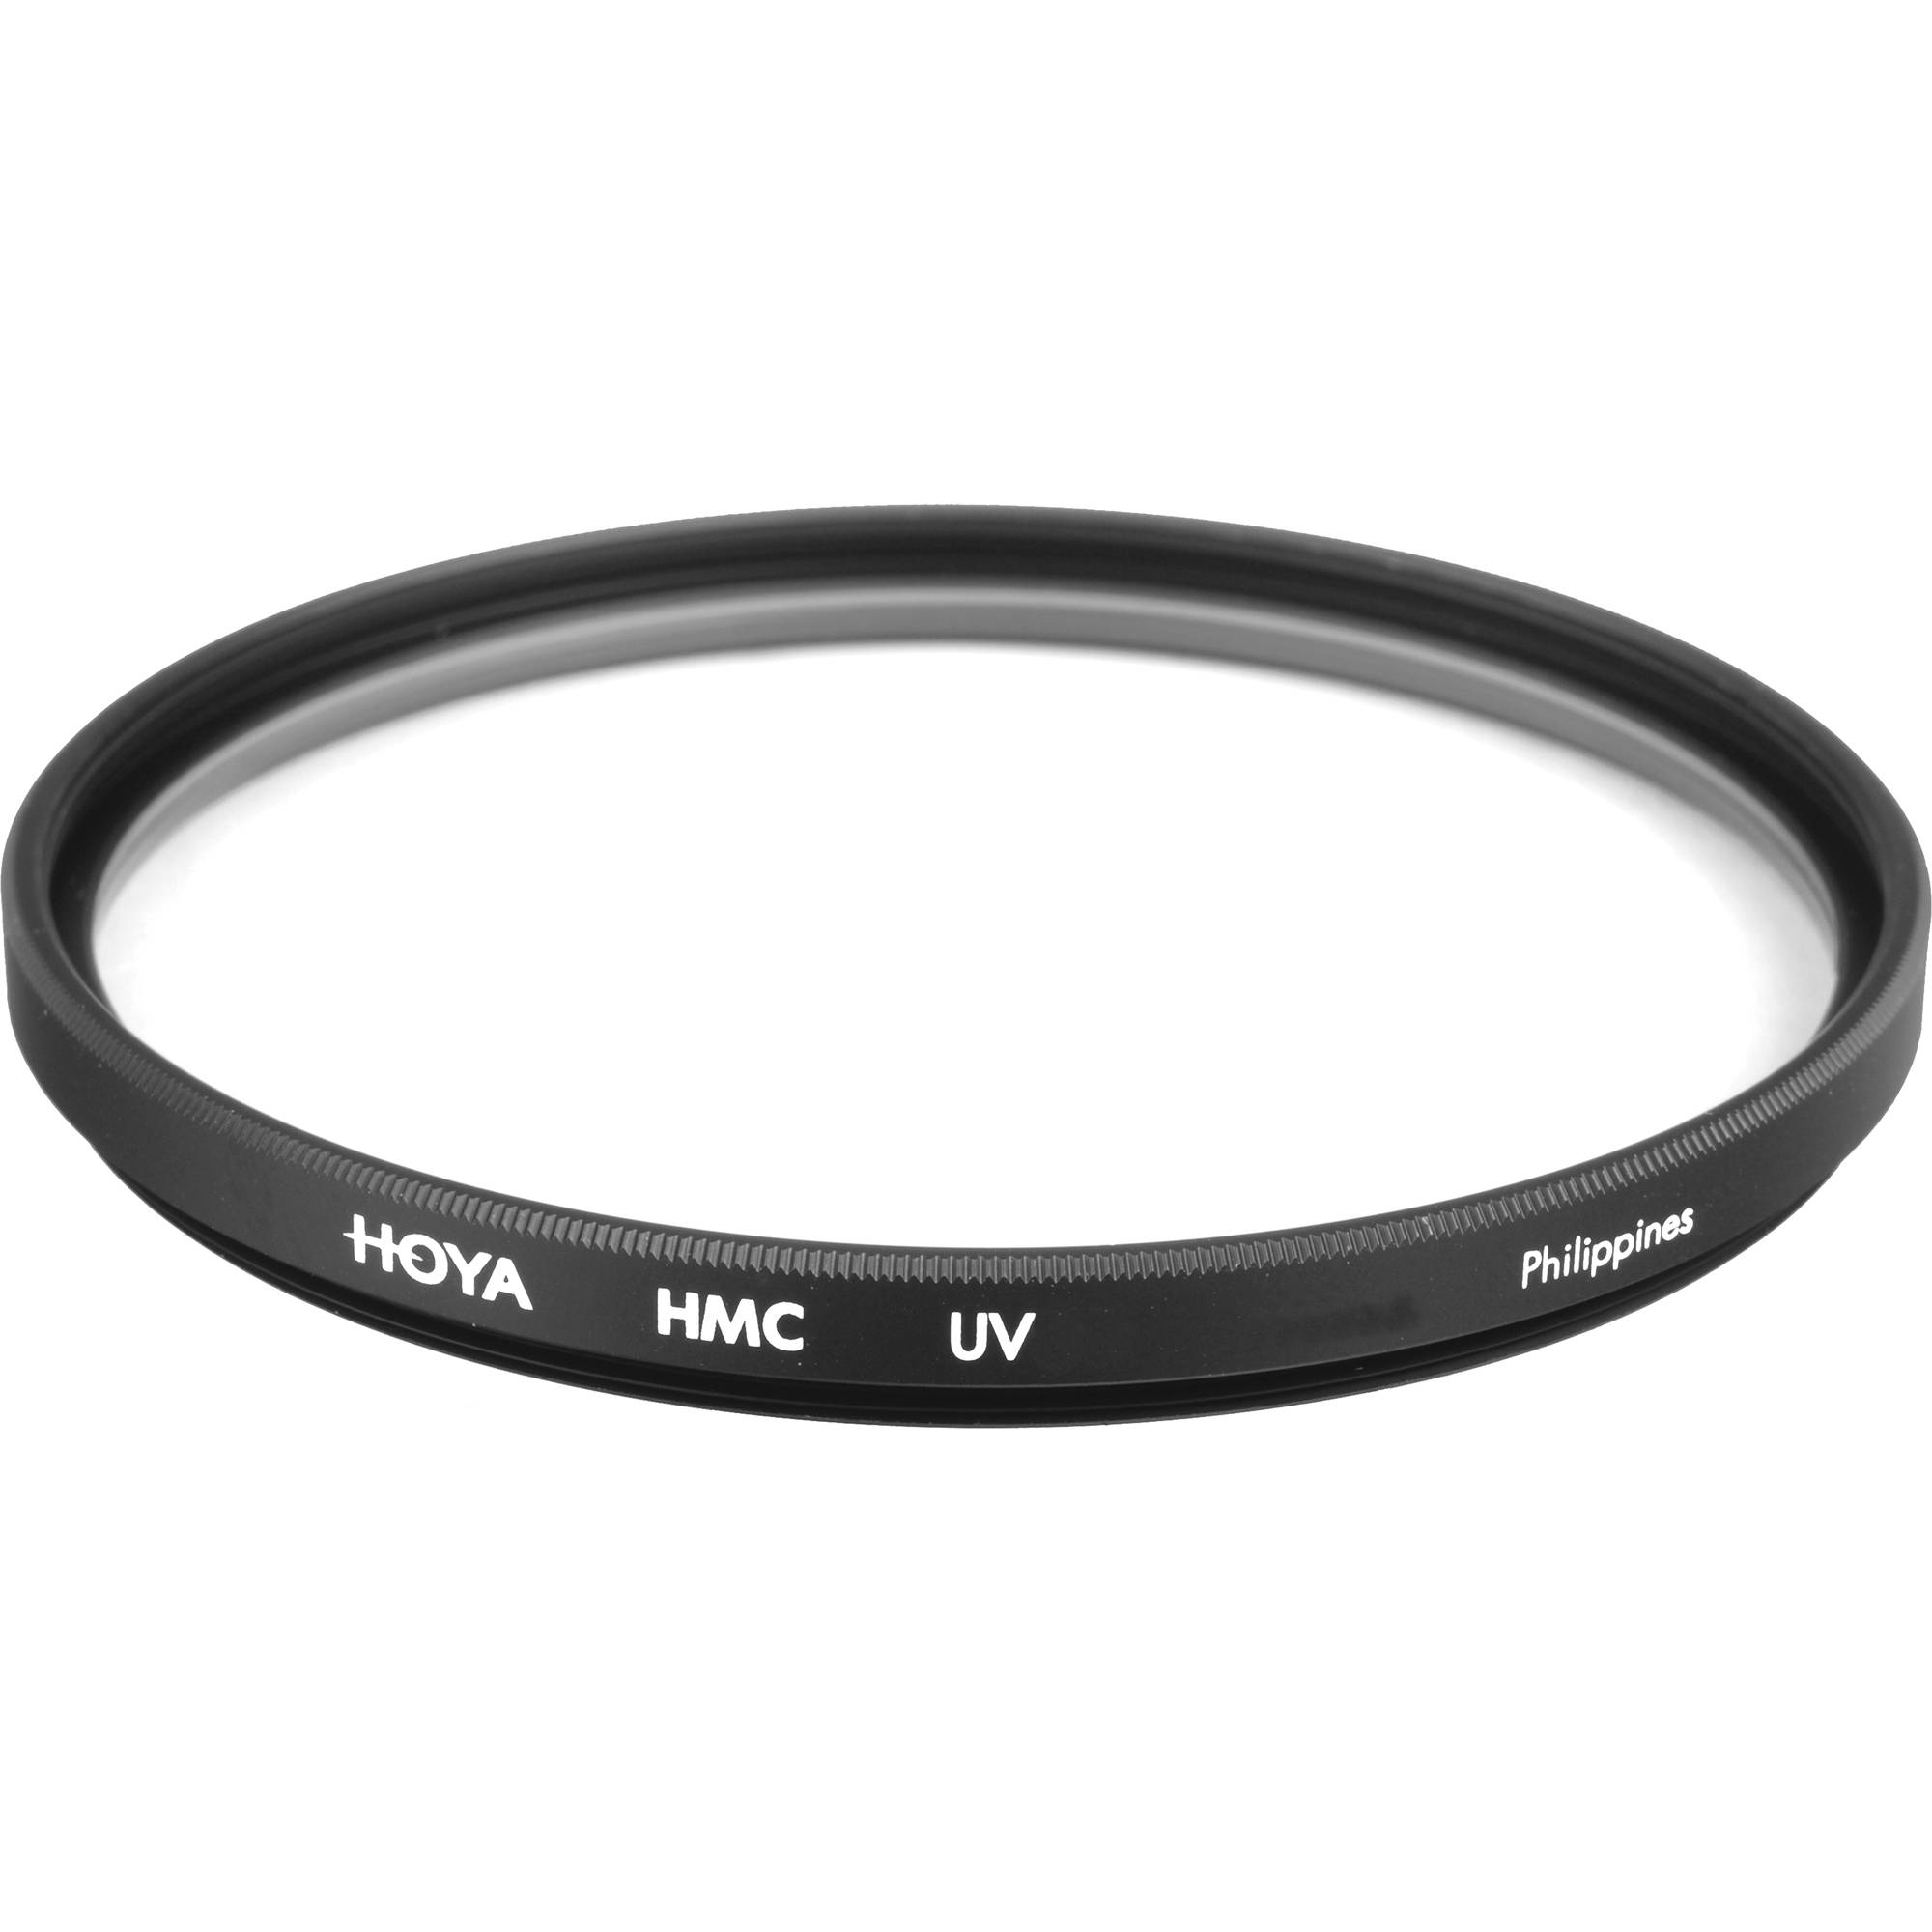 Genuine New  Hoya HMC UV Multi Coated filter 77mm Free UK P+P C